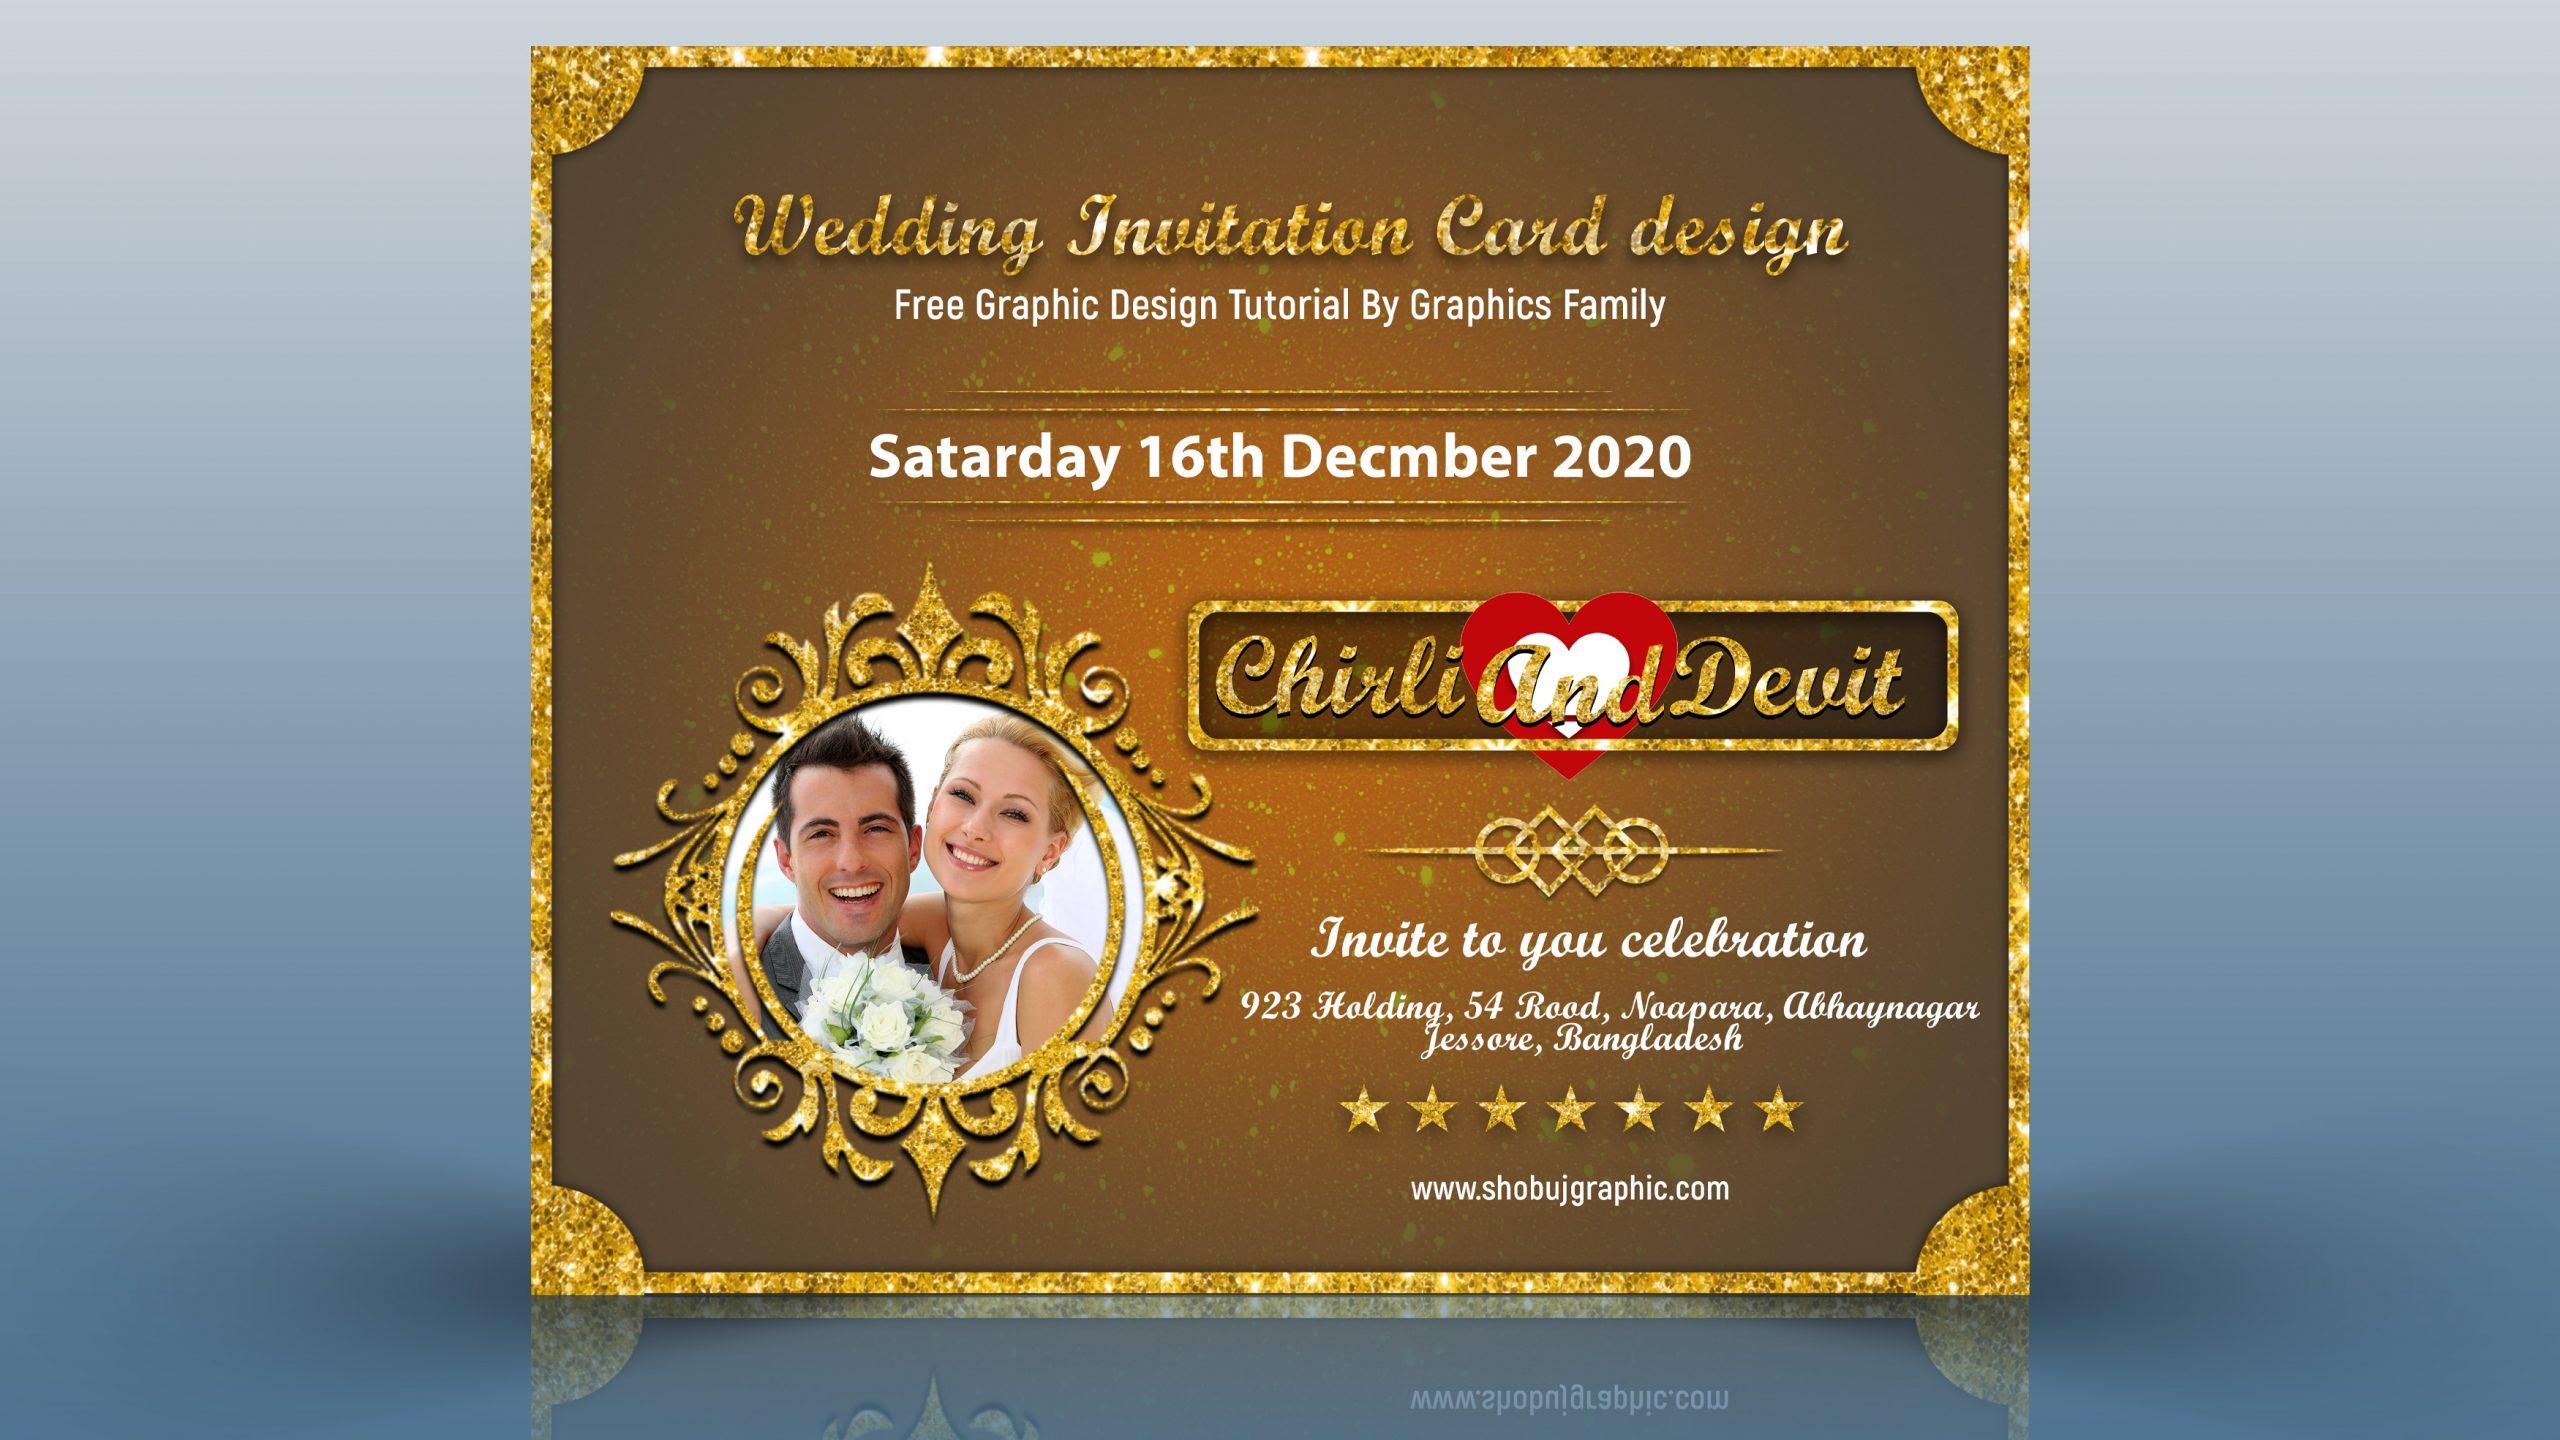 special wedding invitation card design